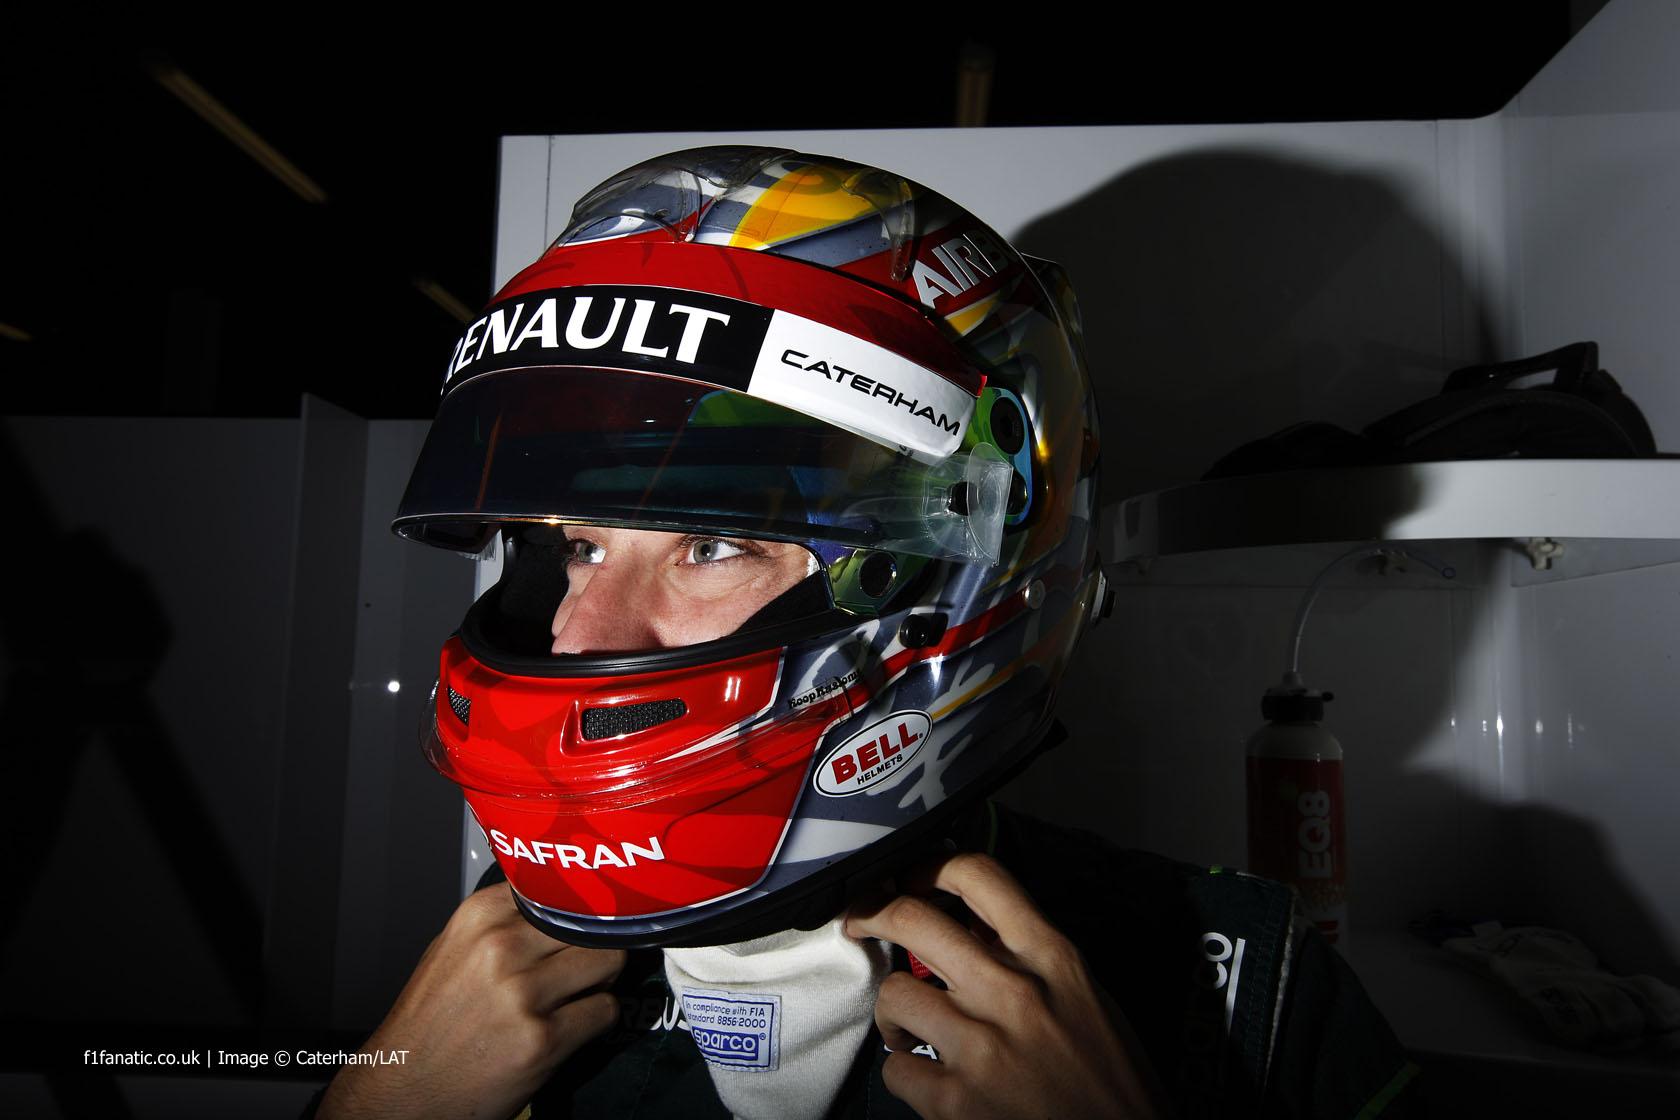 Robin Frijns, Caterham, Silverstone, 2014